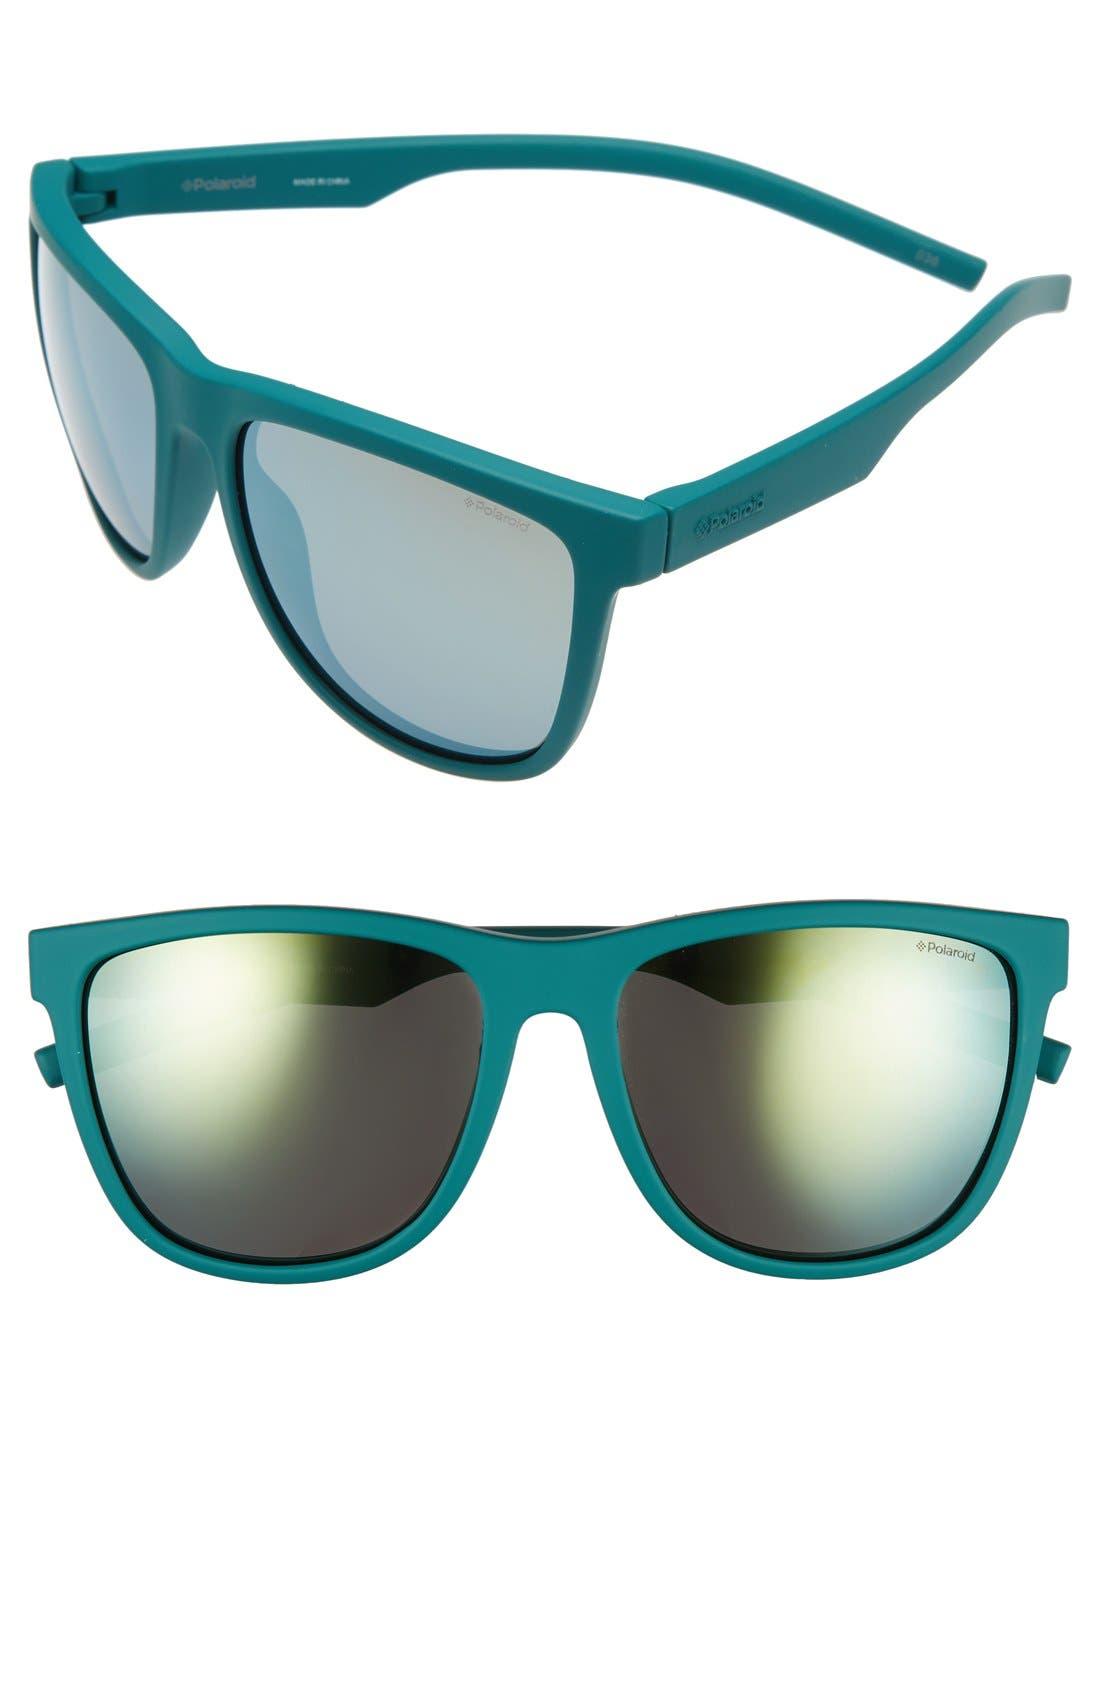 Main Image - Polaroid 56mm Retro Polarized Sunglasses